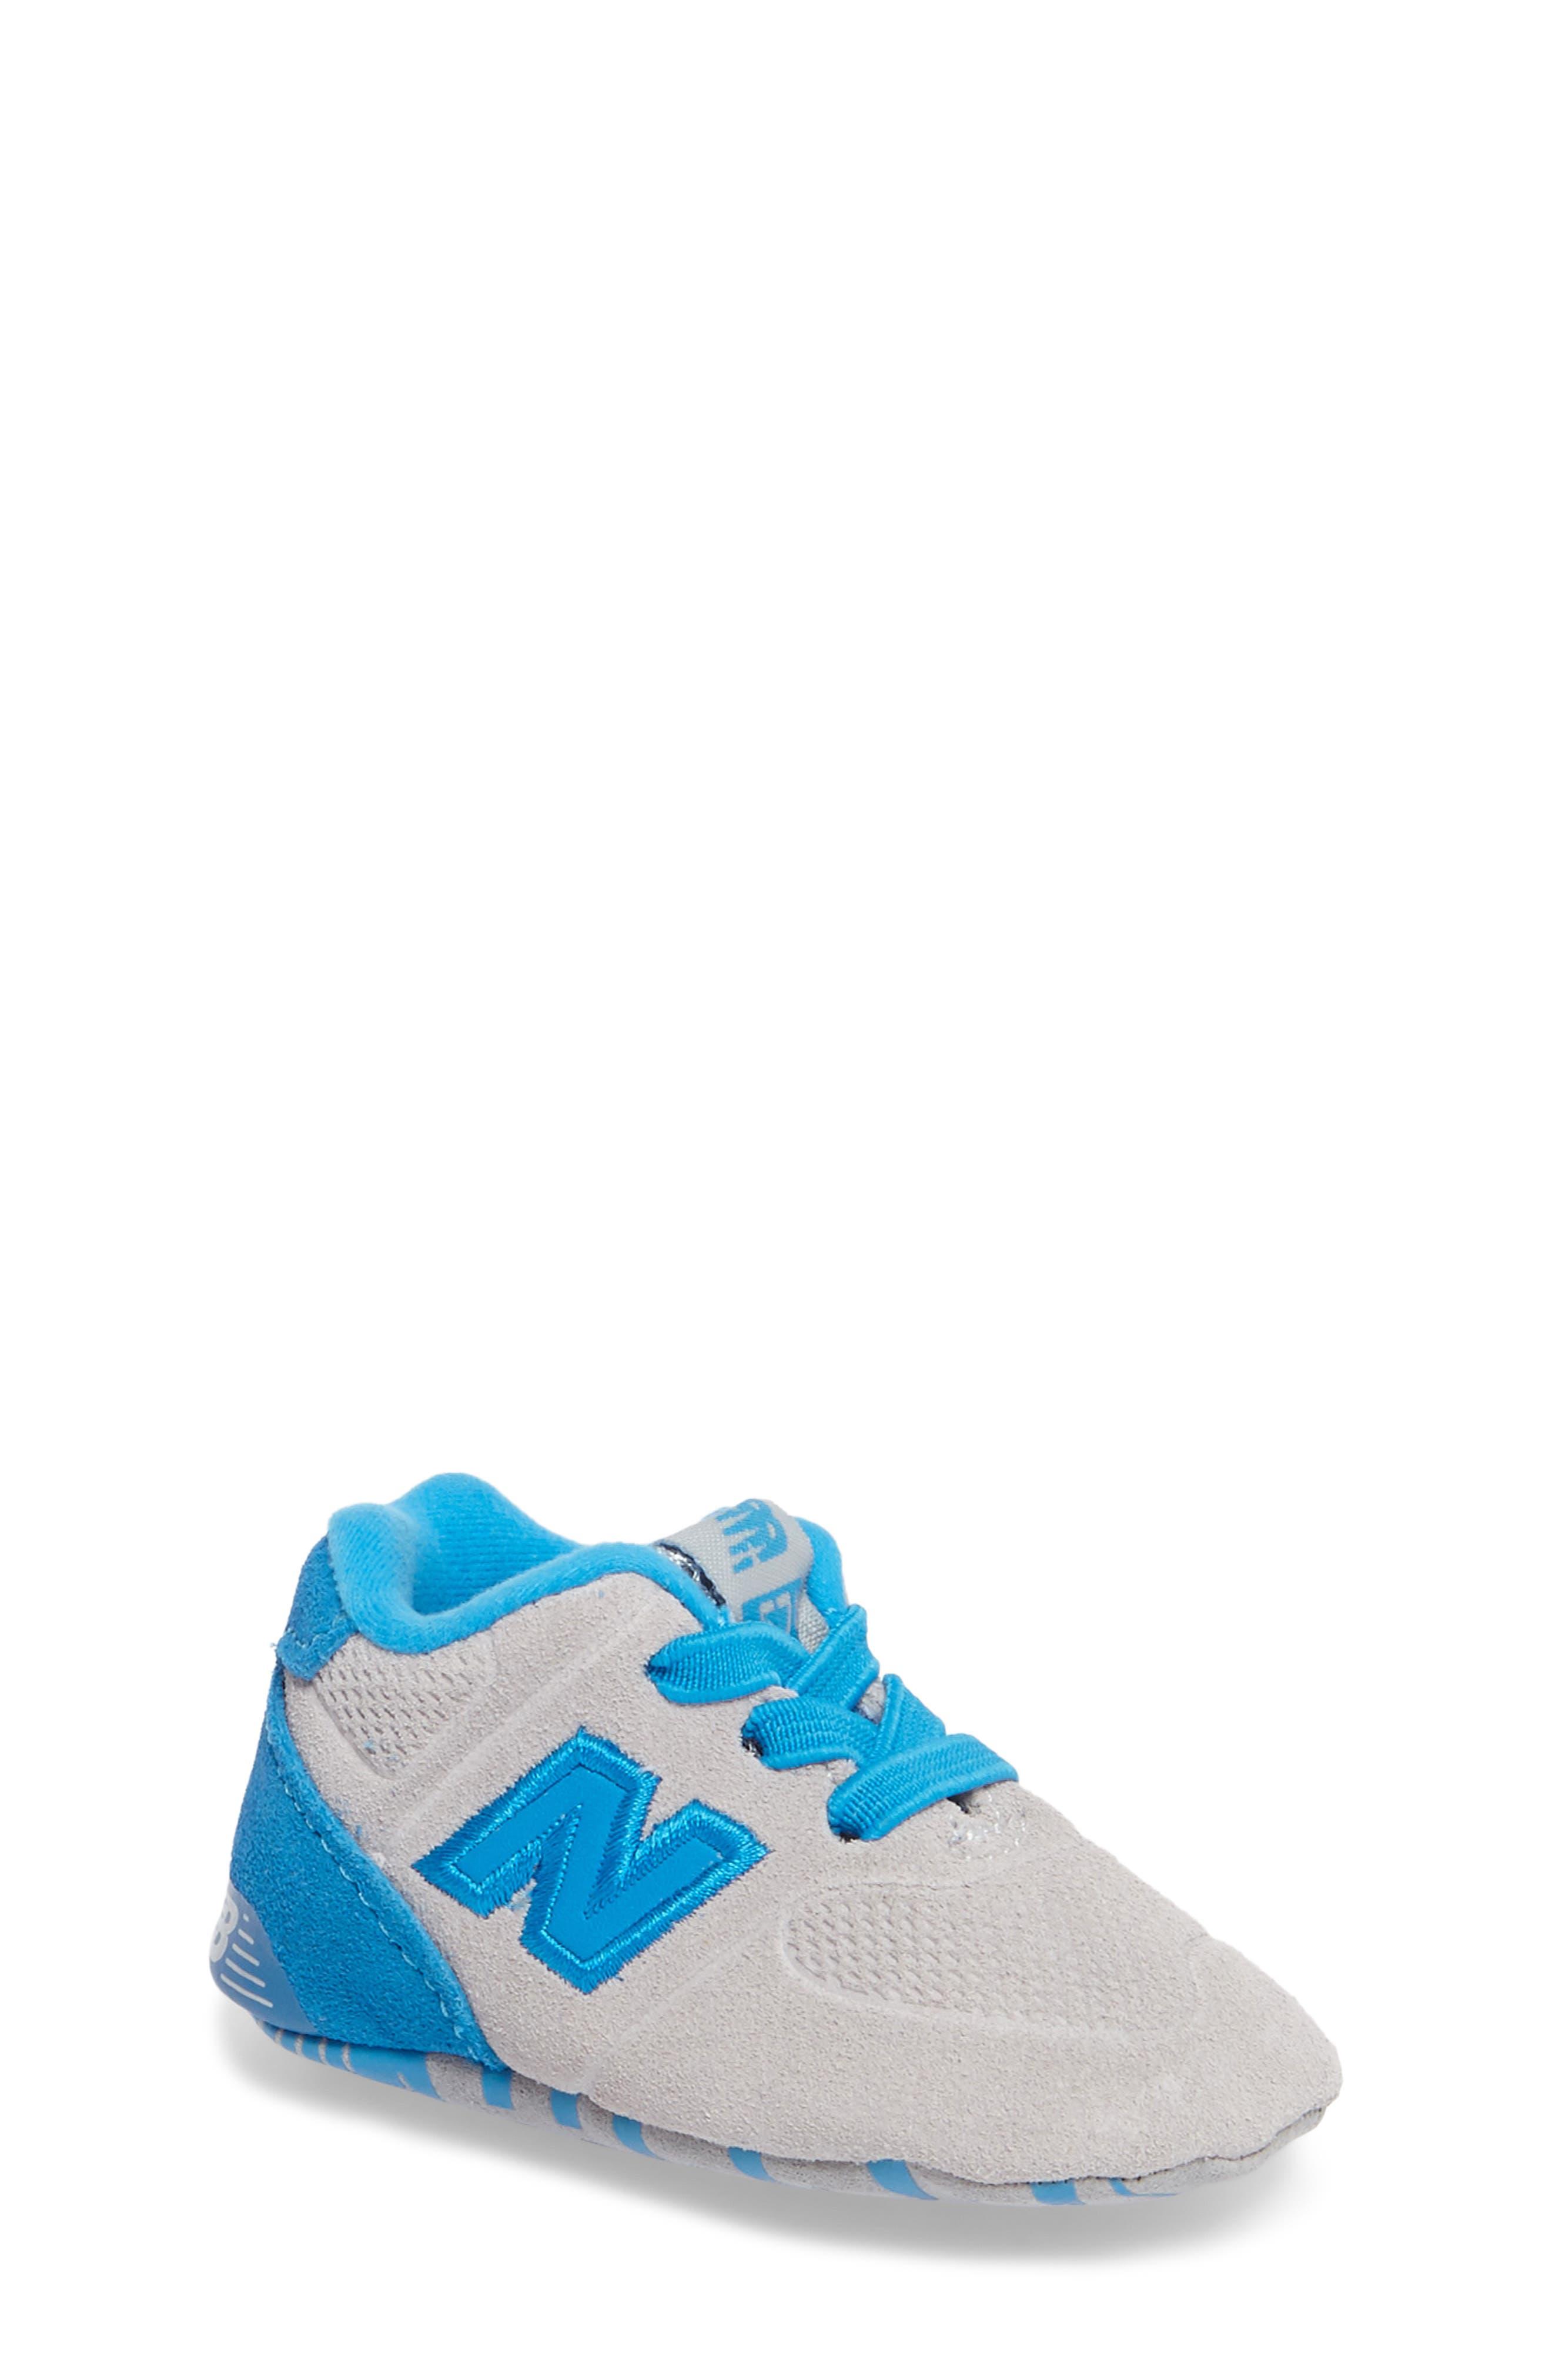 547 Crib Shoe,                         Main,                         color, Blue/ Grey